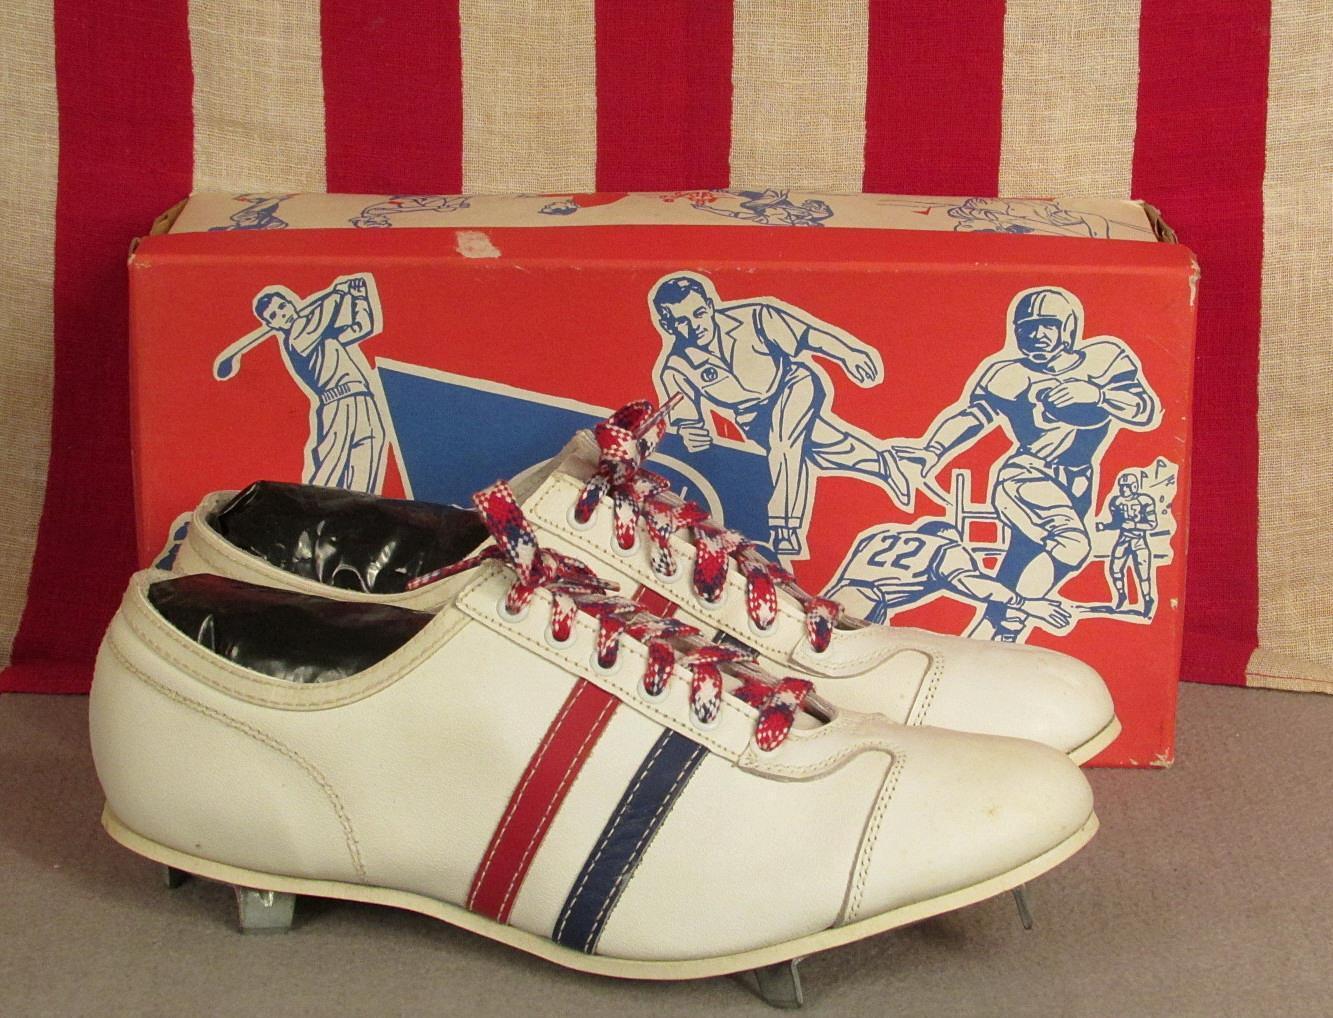 Vintage Gotham Leder Baseball Top Schuhes Cleats Niedrig Top Baseball ROT/Wht/Blau NOS w/Box Sz.9 90d118